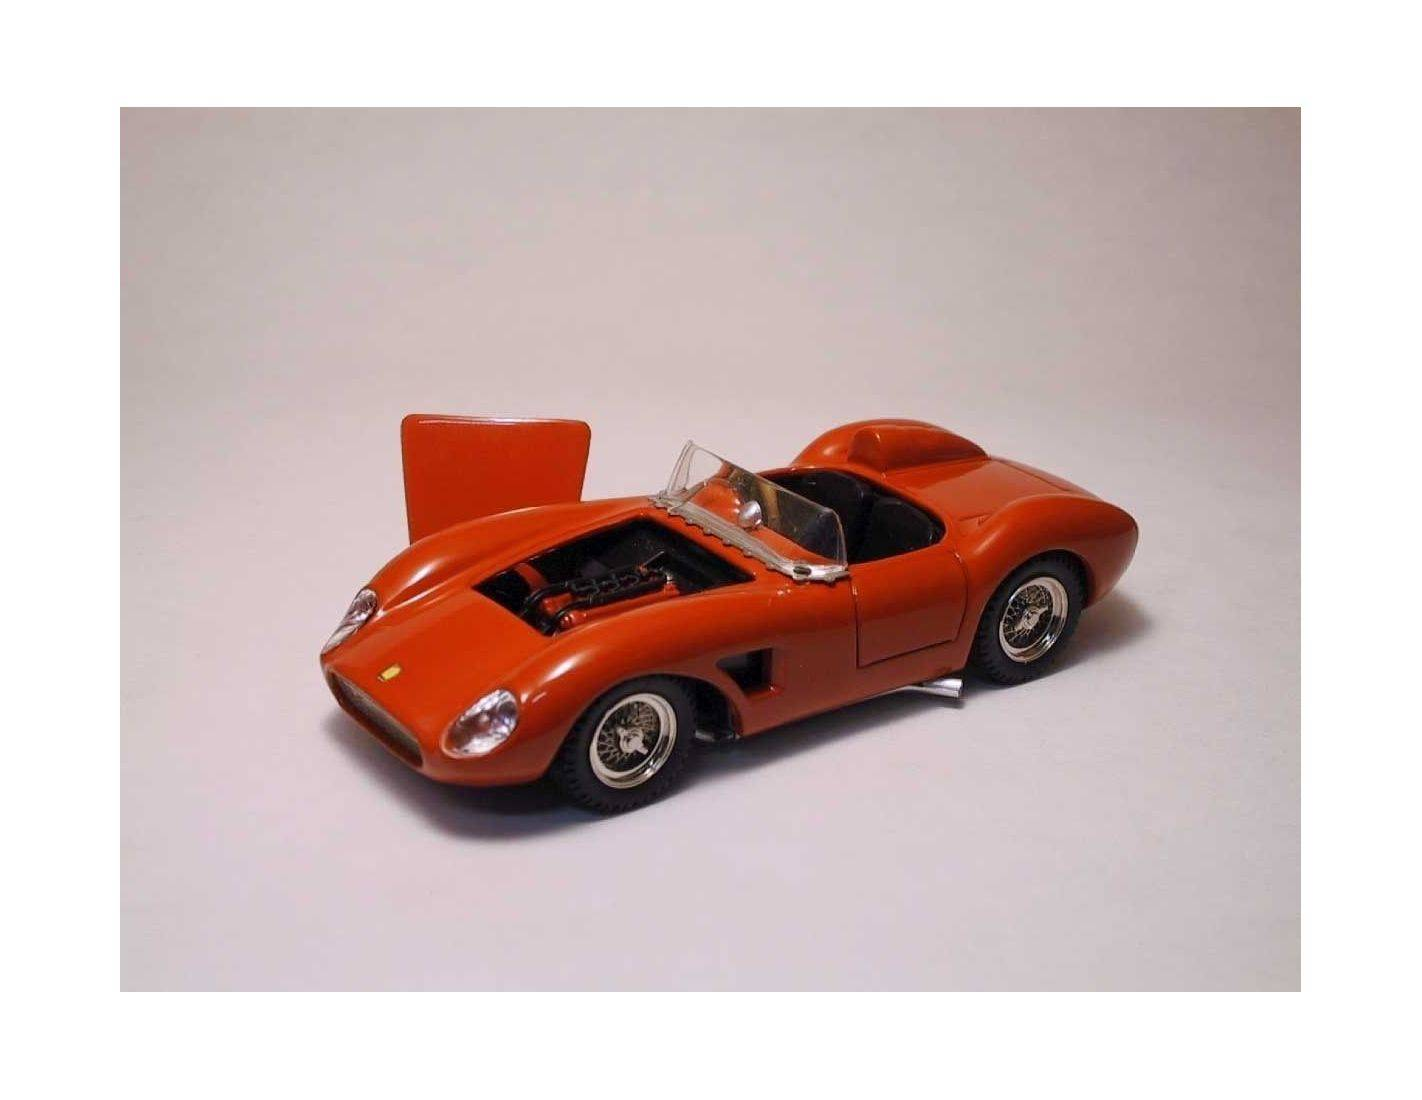 Art Model AM0014 FERRARI 500 TRC 1956 RED 1:43 Modellino